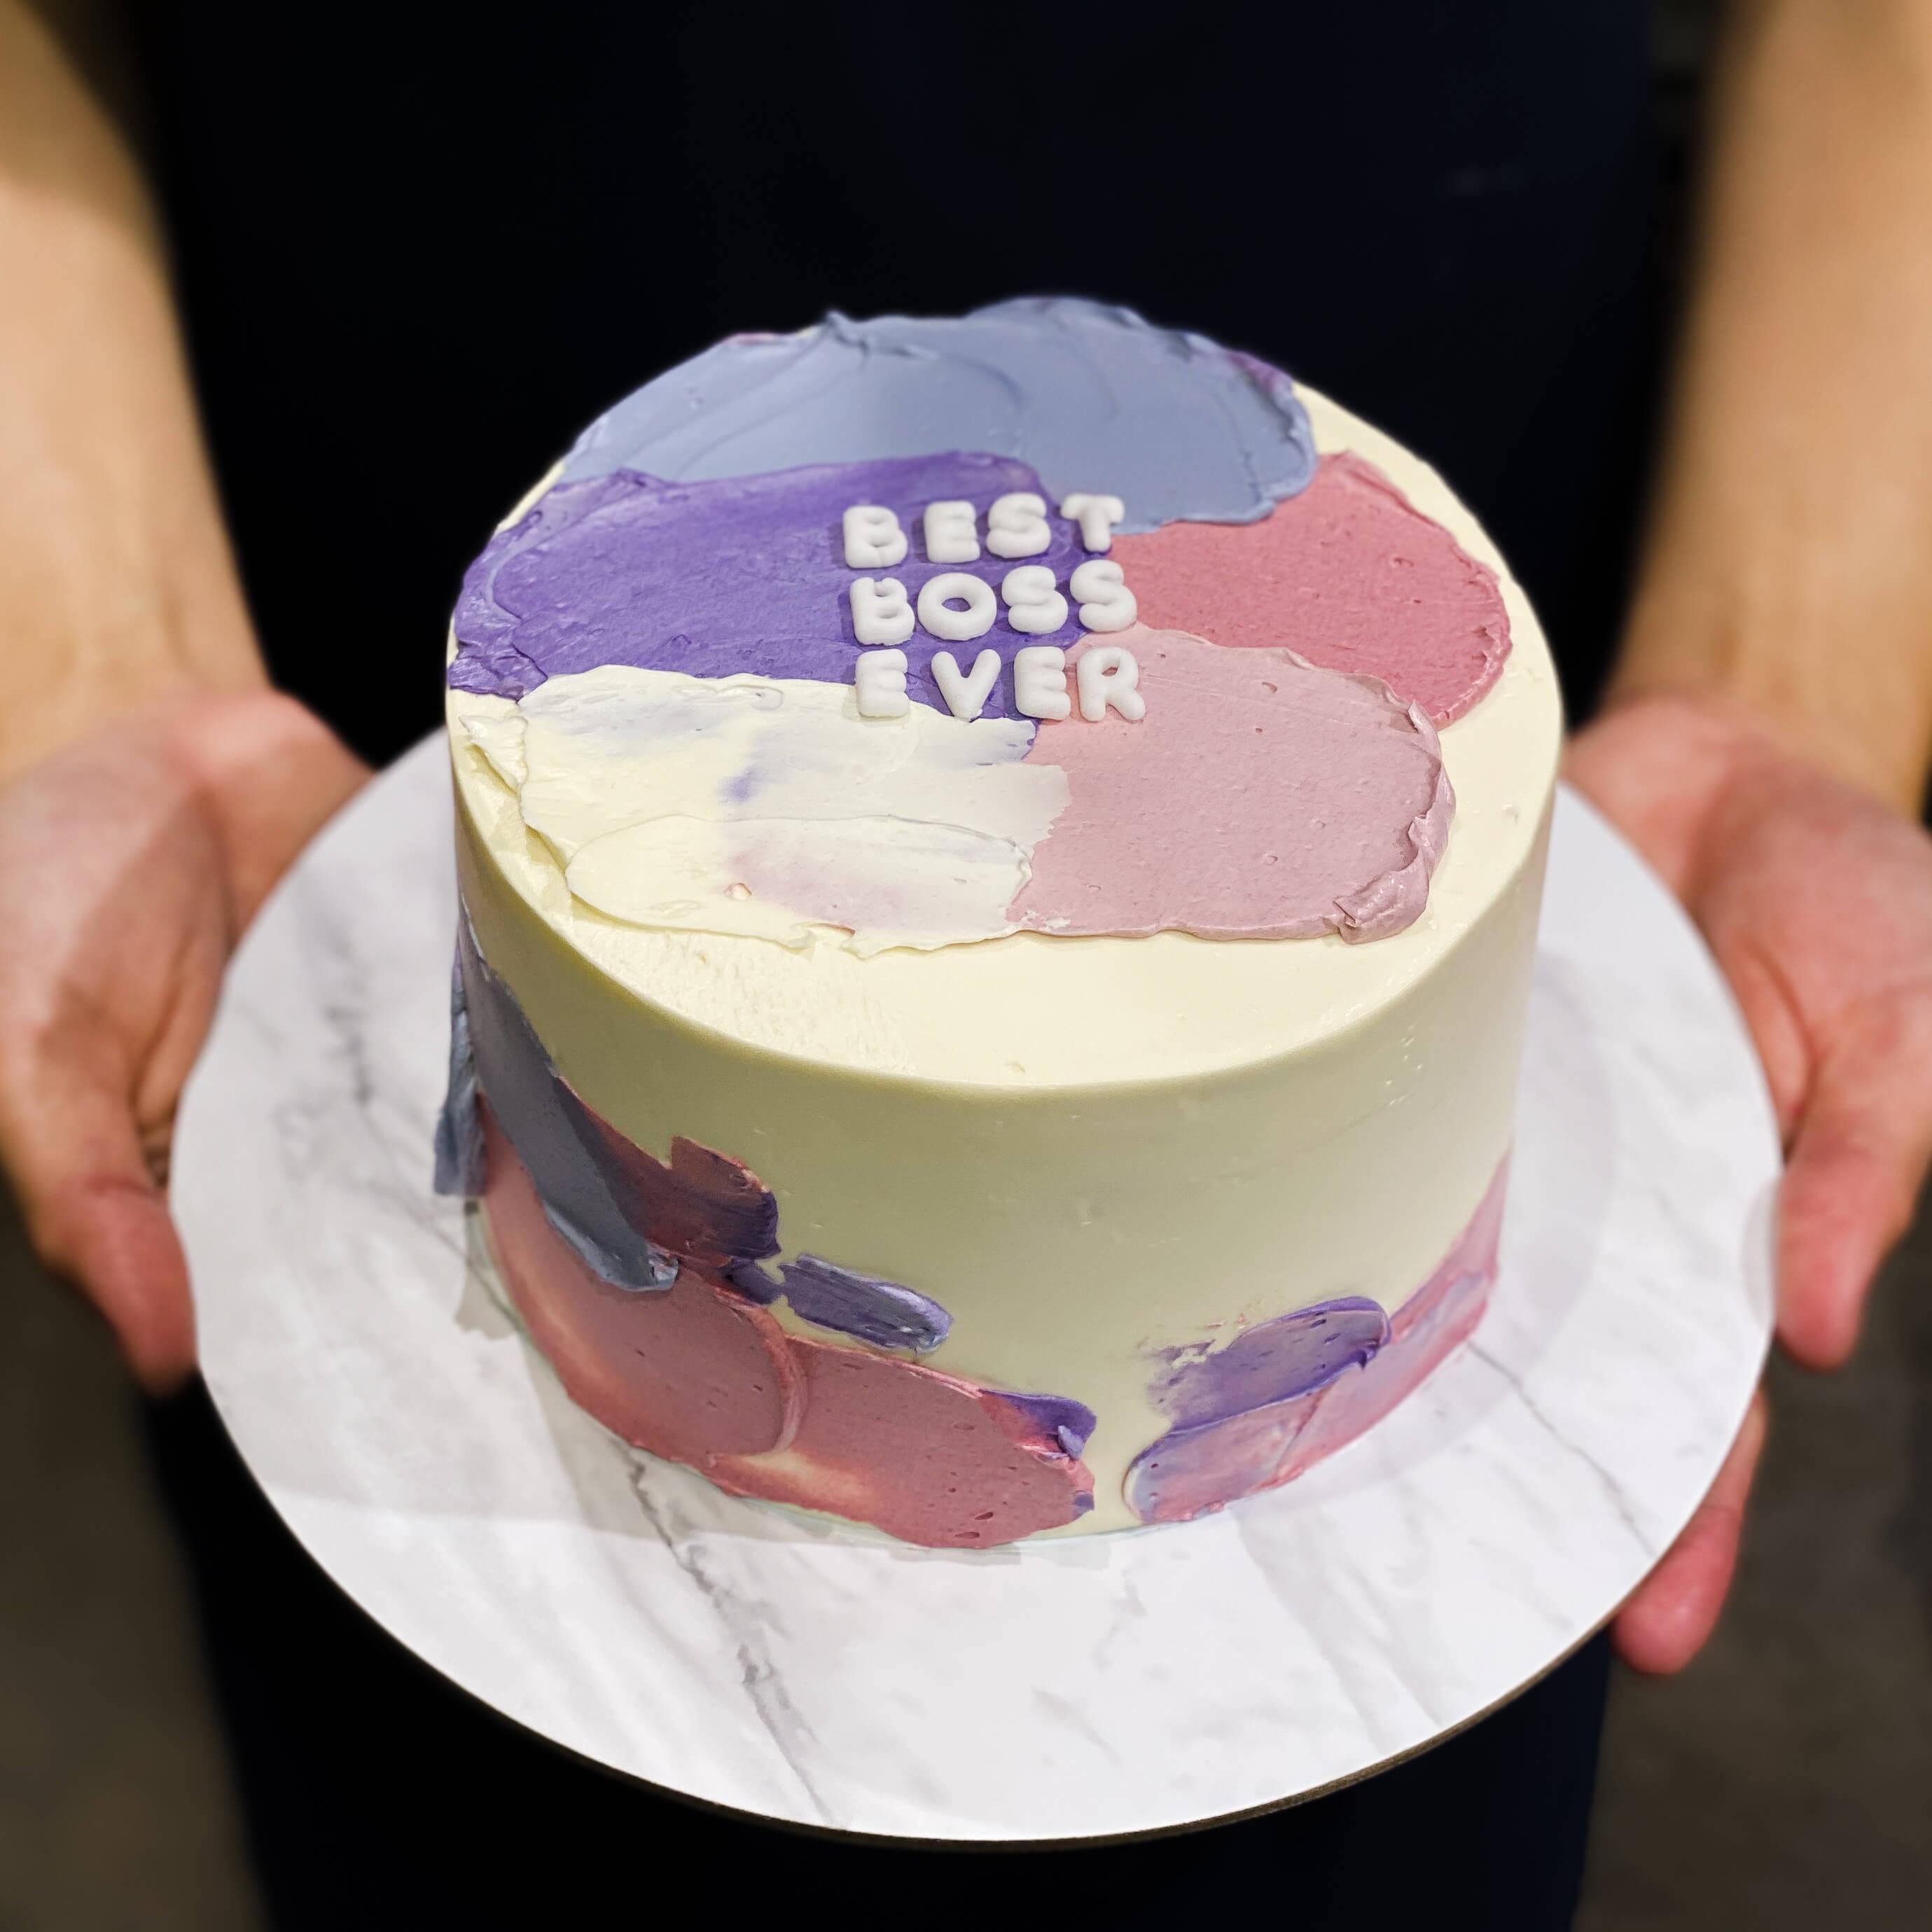 Sensational Customised Korean Cakes Singapore Bob The Baker Boy Funny Birthday Cards Online Elaedamsfinfo